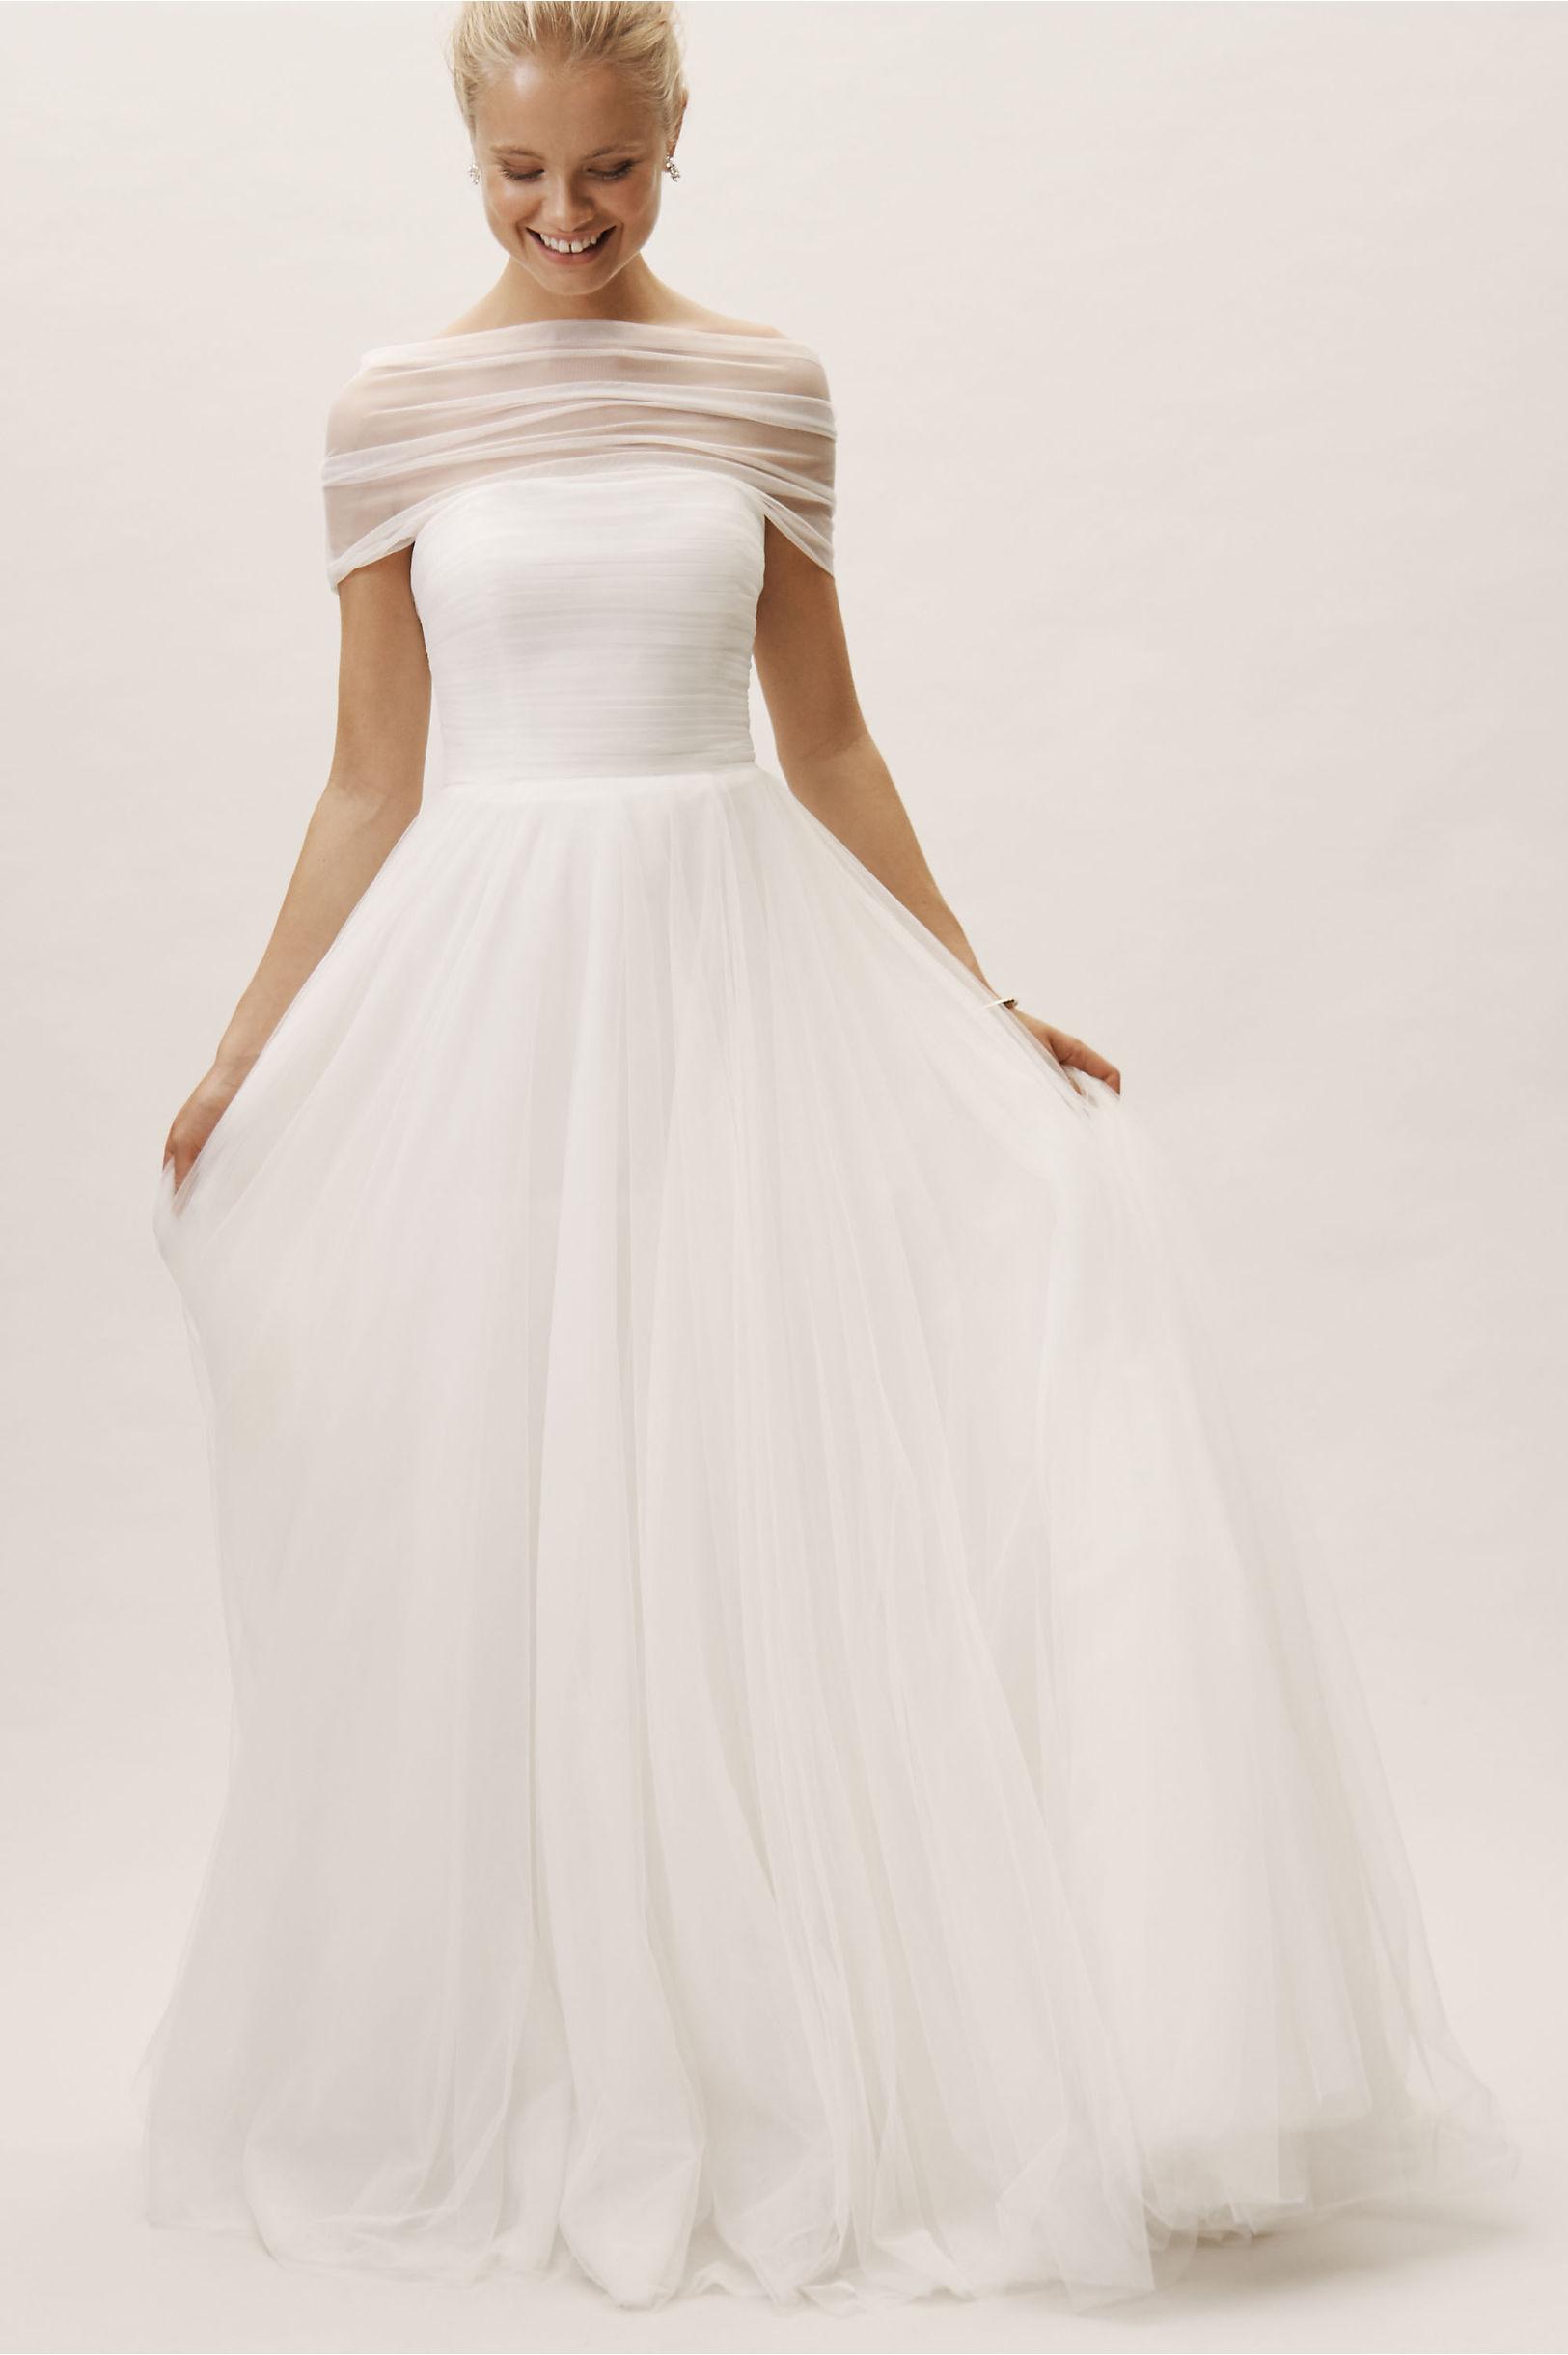 Plus Size Wedding Gowns Chicago Il